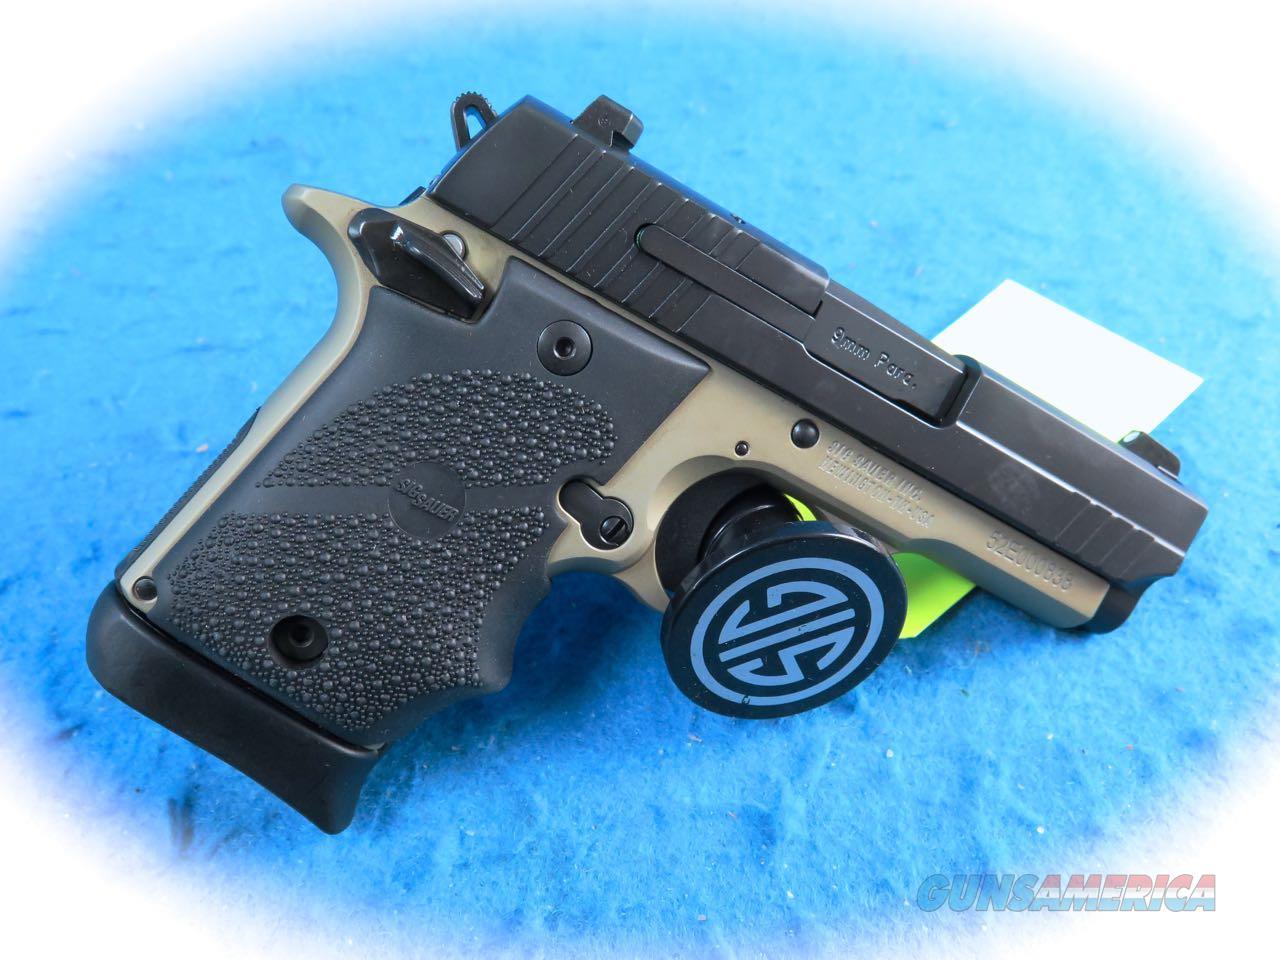 Sig Sauer P938 9mm Semi Auto Pistol Desert/Black Model 938-9-DB-AMBI **New**  Guns > Pistols > Sig - Sauer/Sigarms Pistols > P938